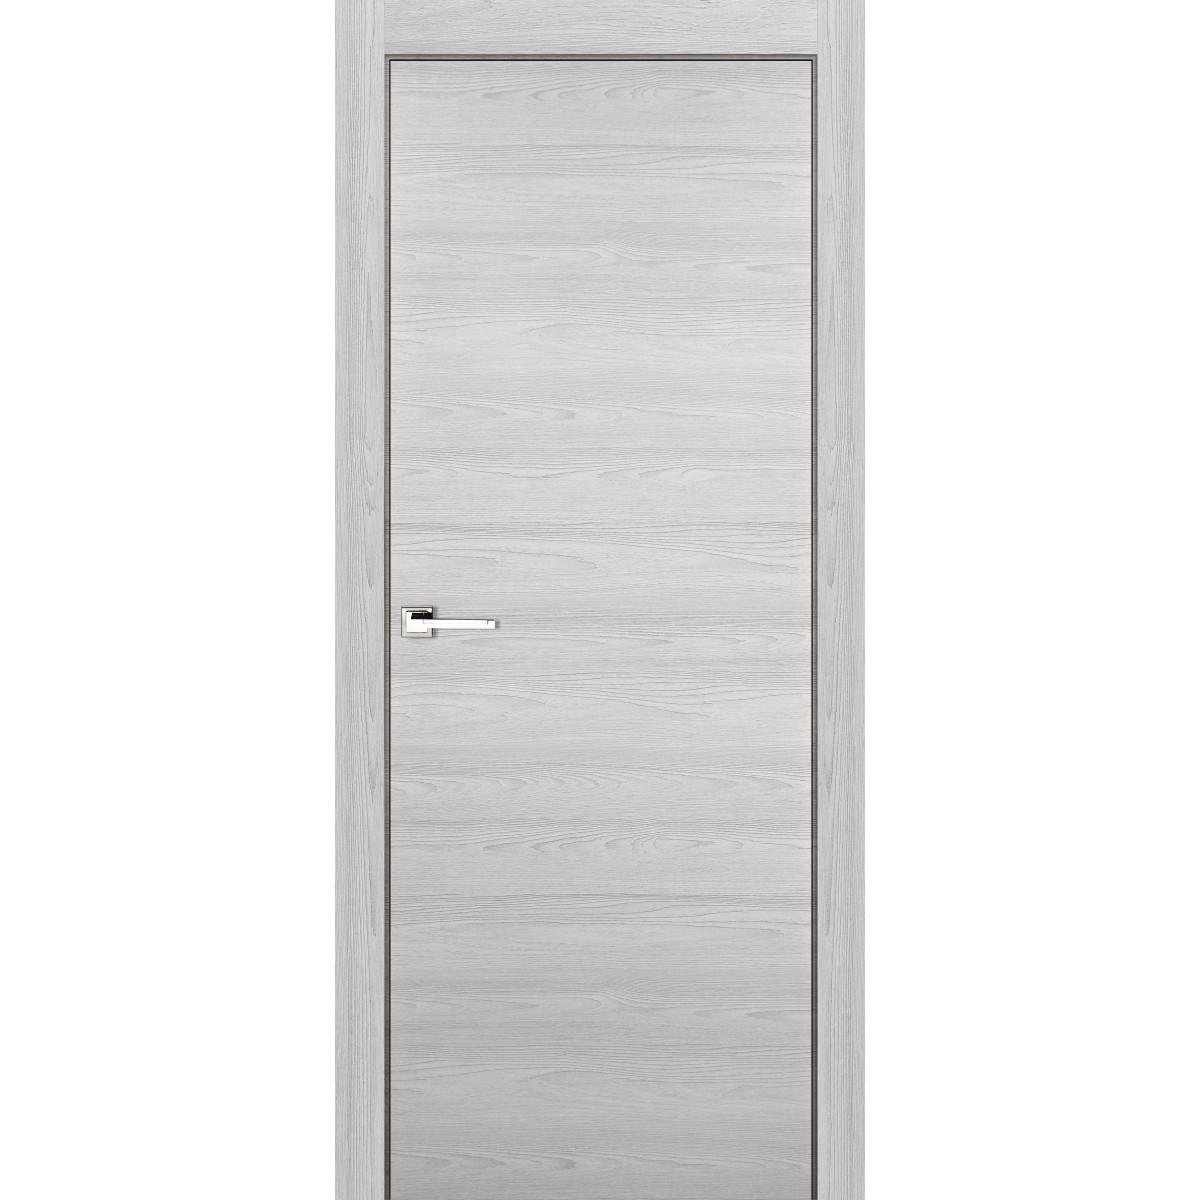 Дверь Межкомнатная Глухая 80x200 Ламинация Цвет Ясень Серый